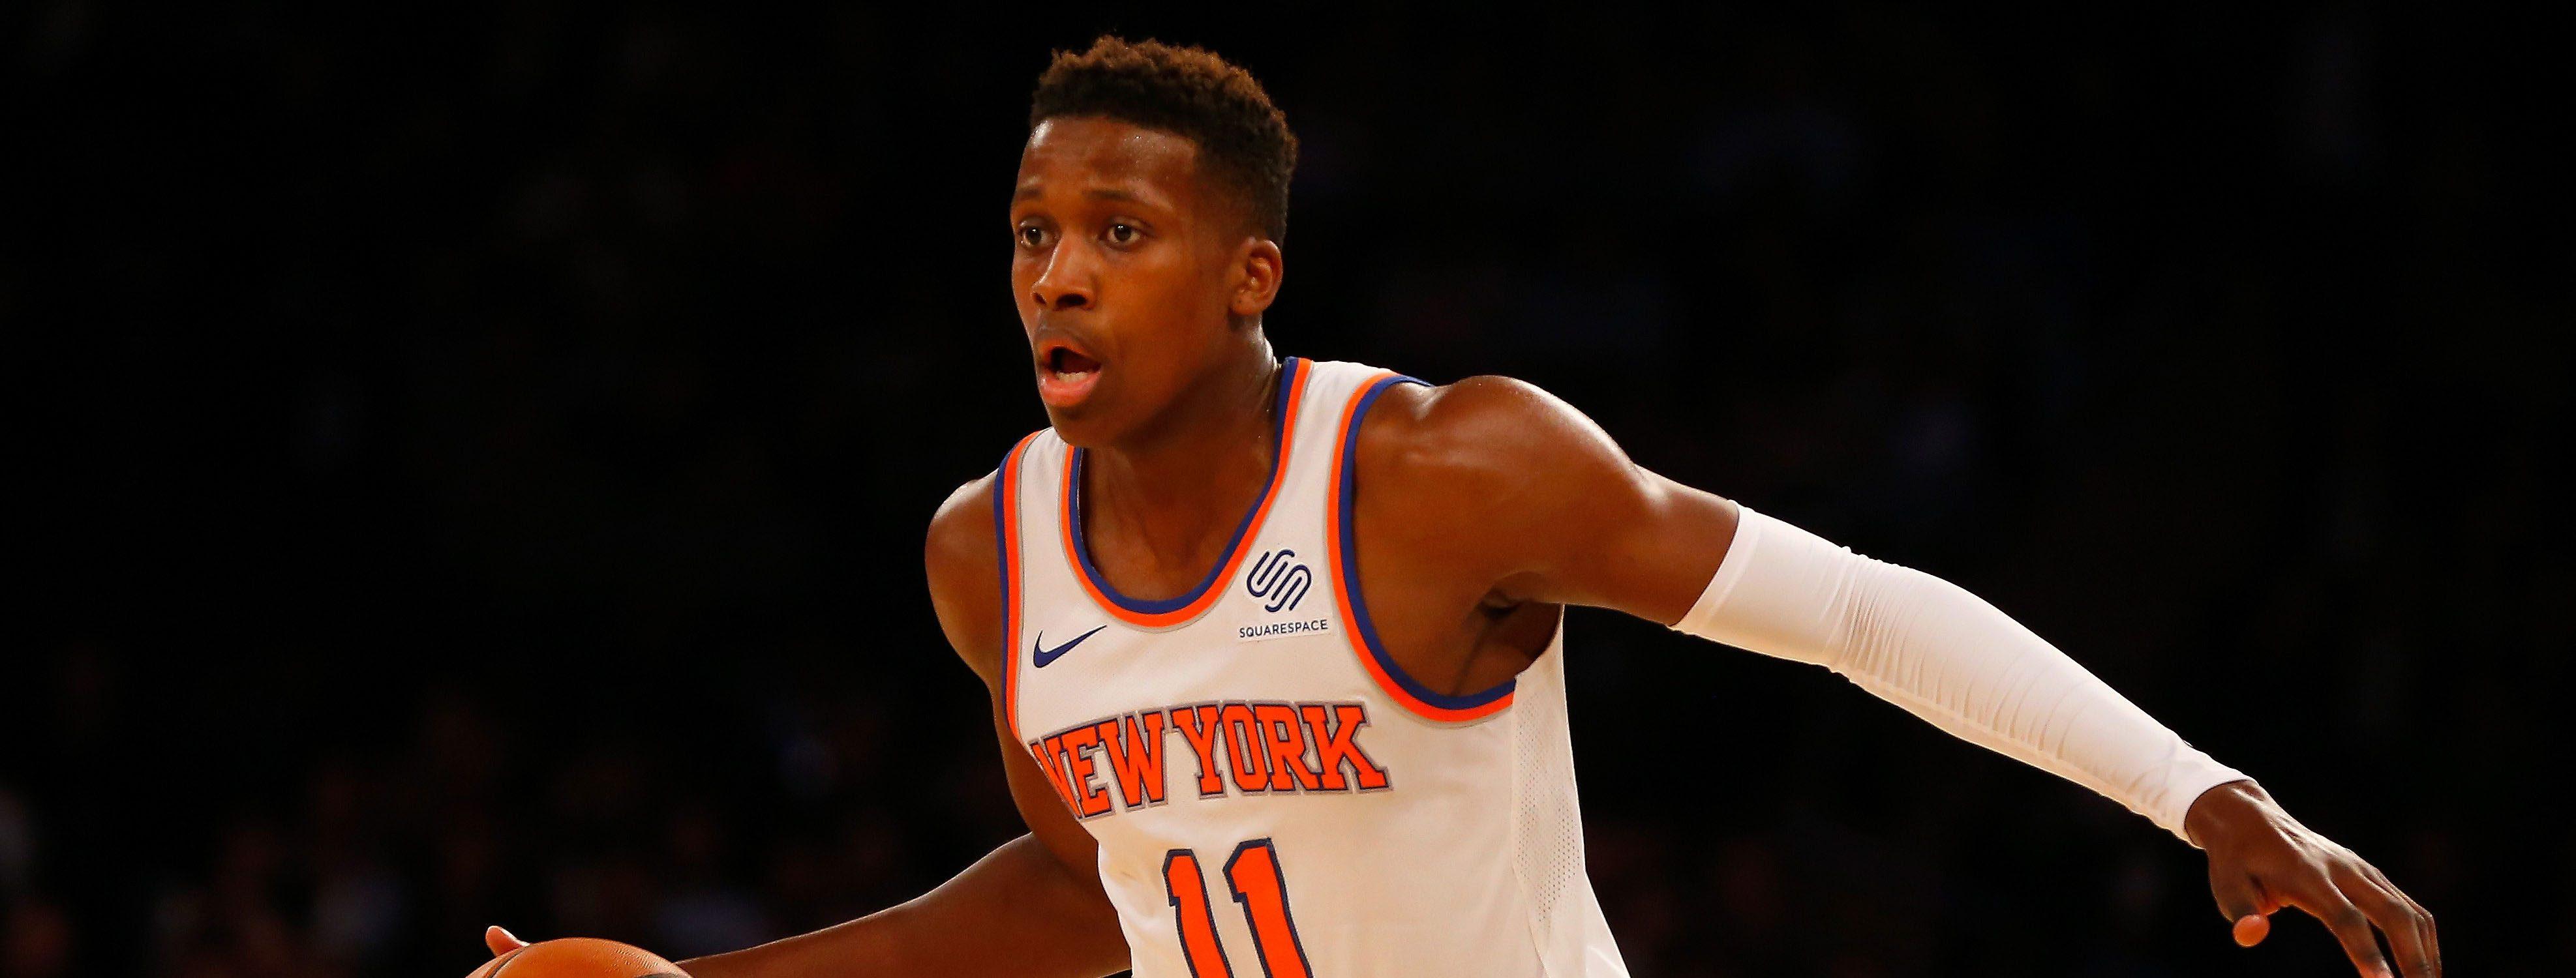 Frank Ntilikina, balle en main, sous le maillot des Knicks